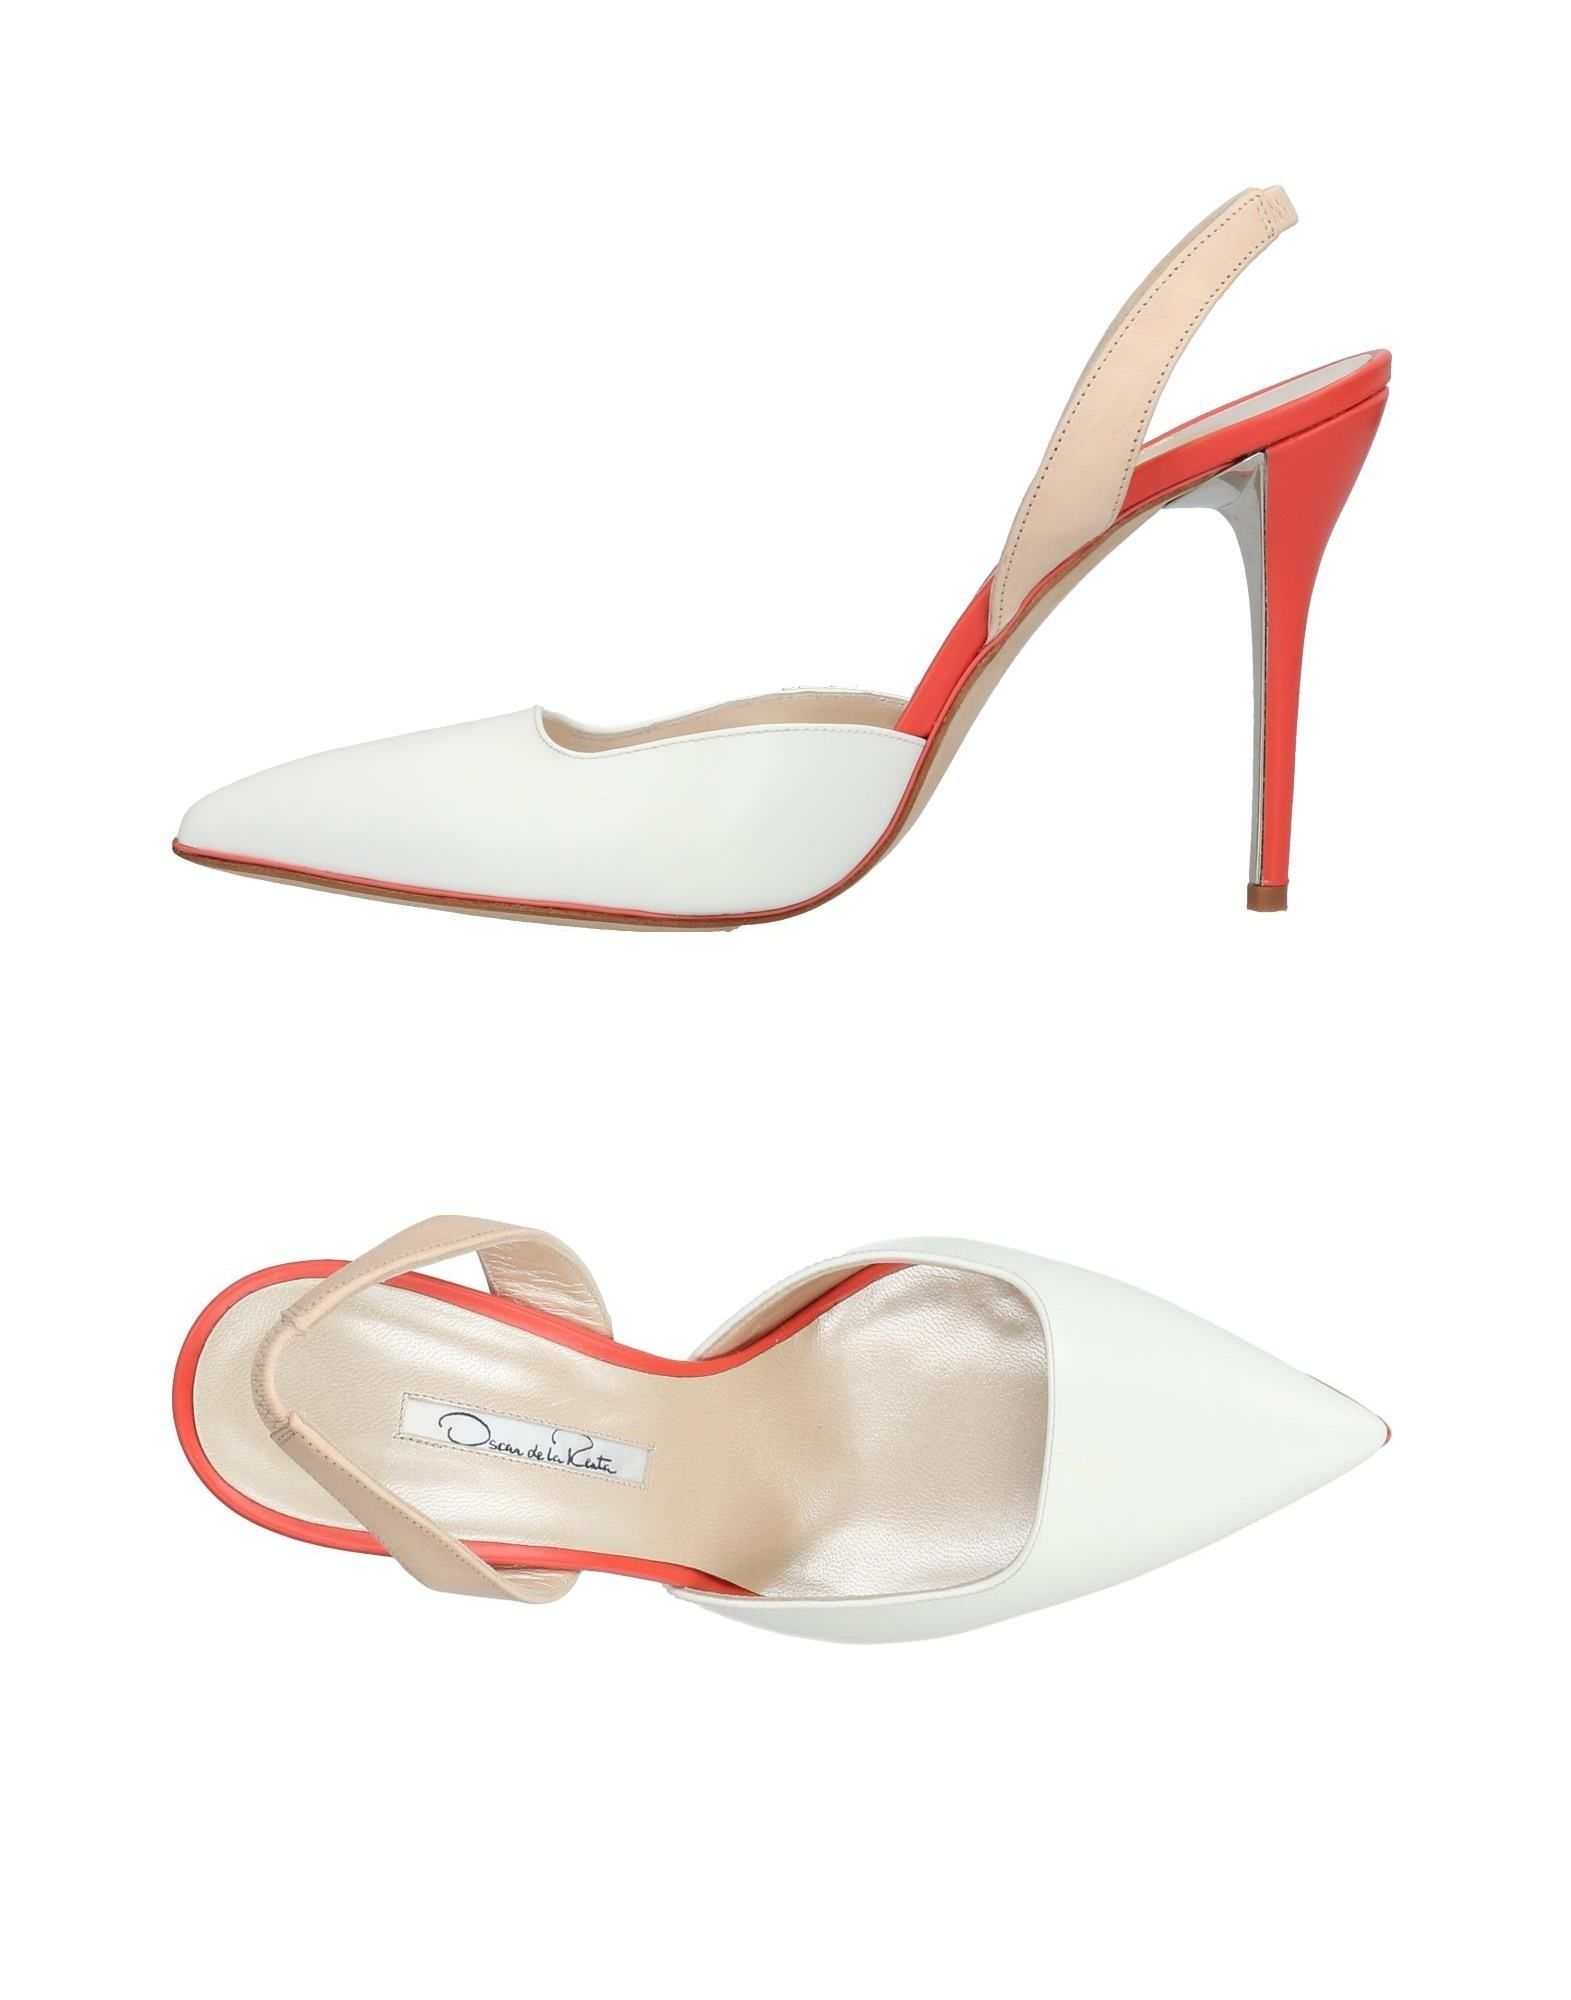 Oscar De La gut Renta Pumps Damen  11439679LVGünstige gut La aussehende Schuhe 643801